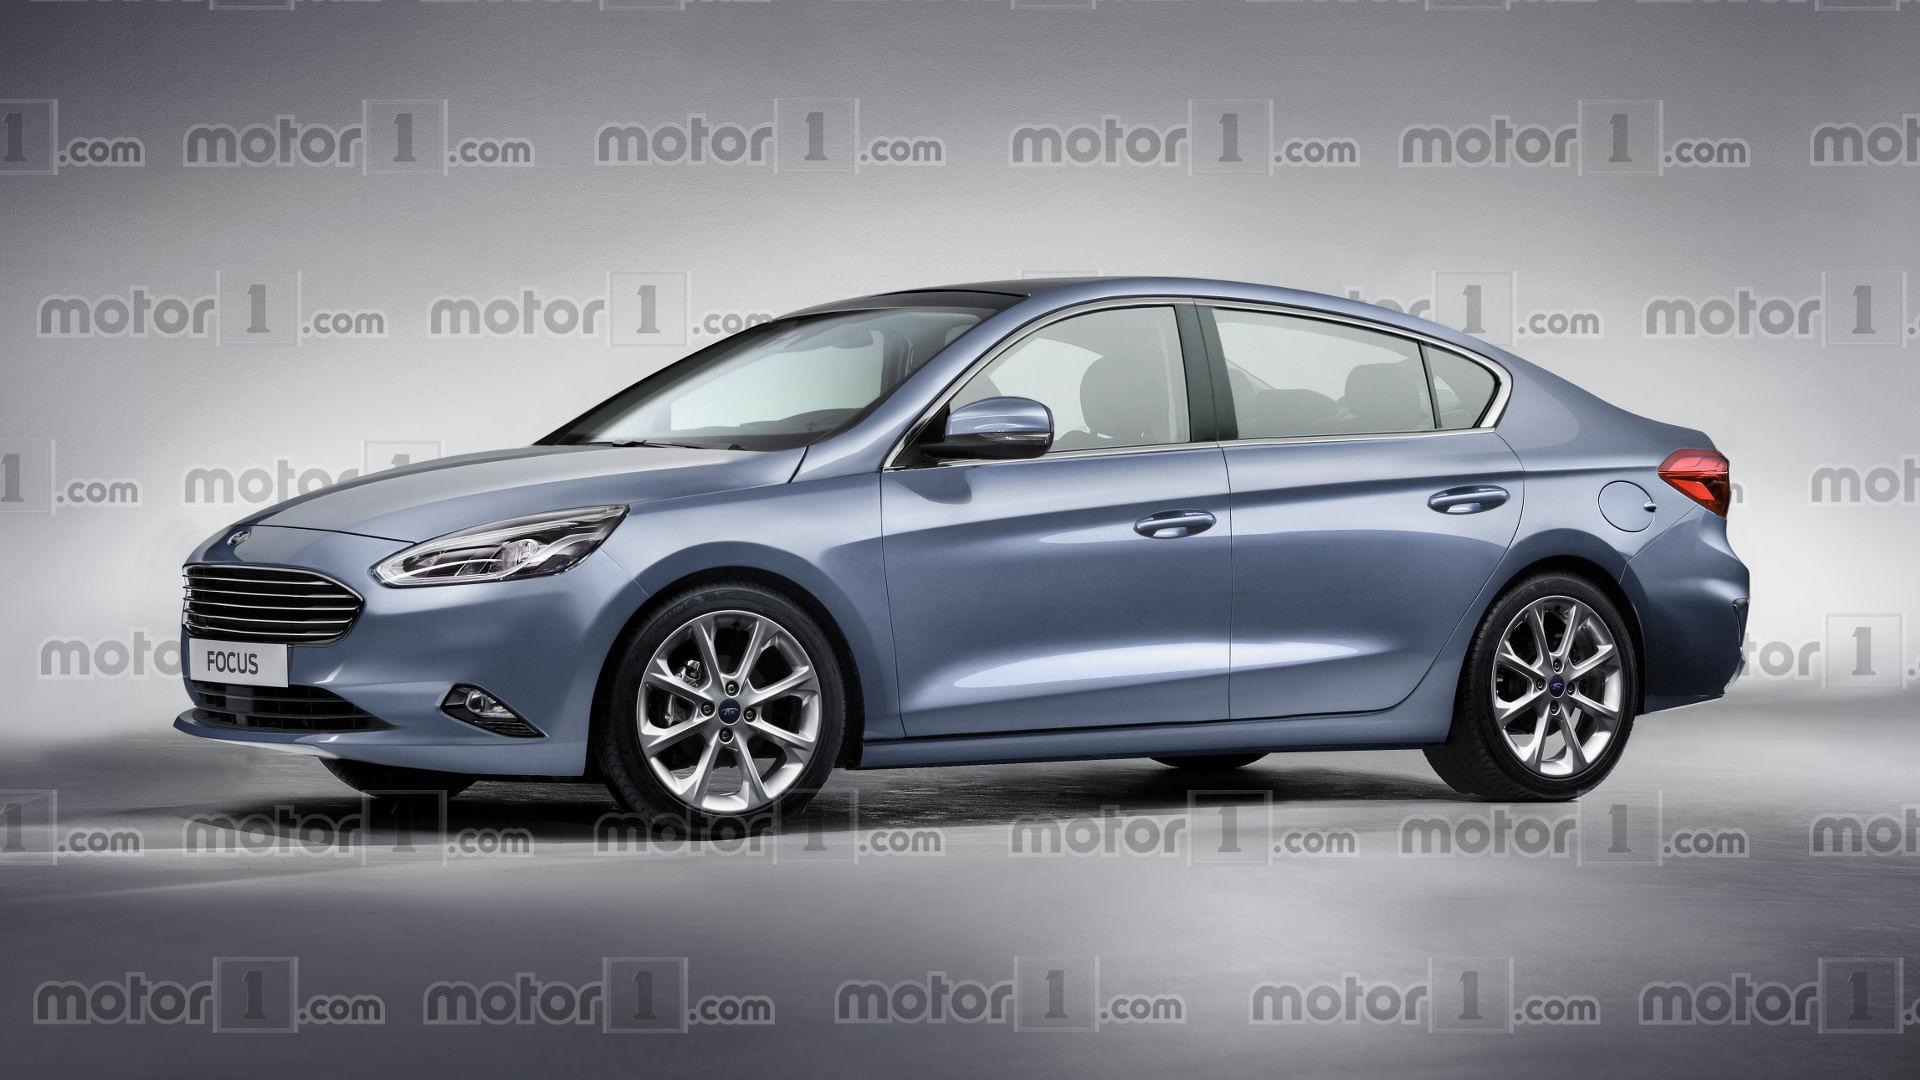 2018 Ford Focus Sedan | Upcomingcarshq.com